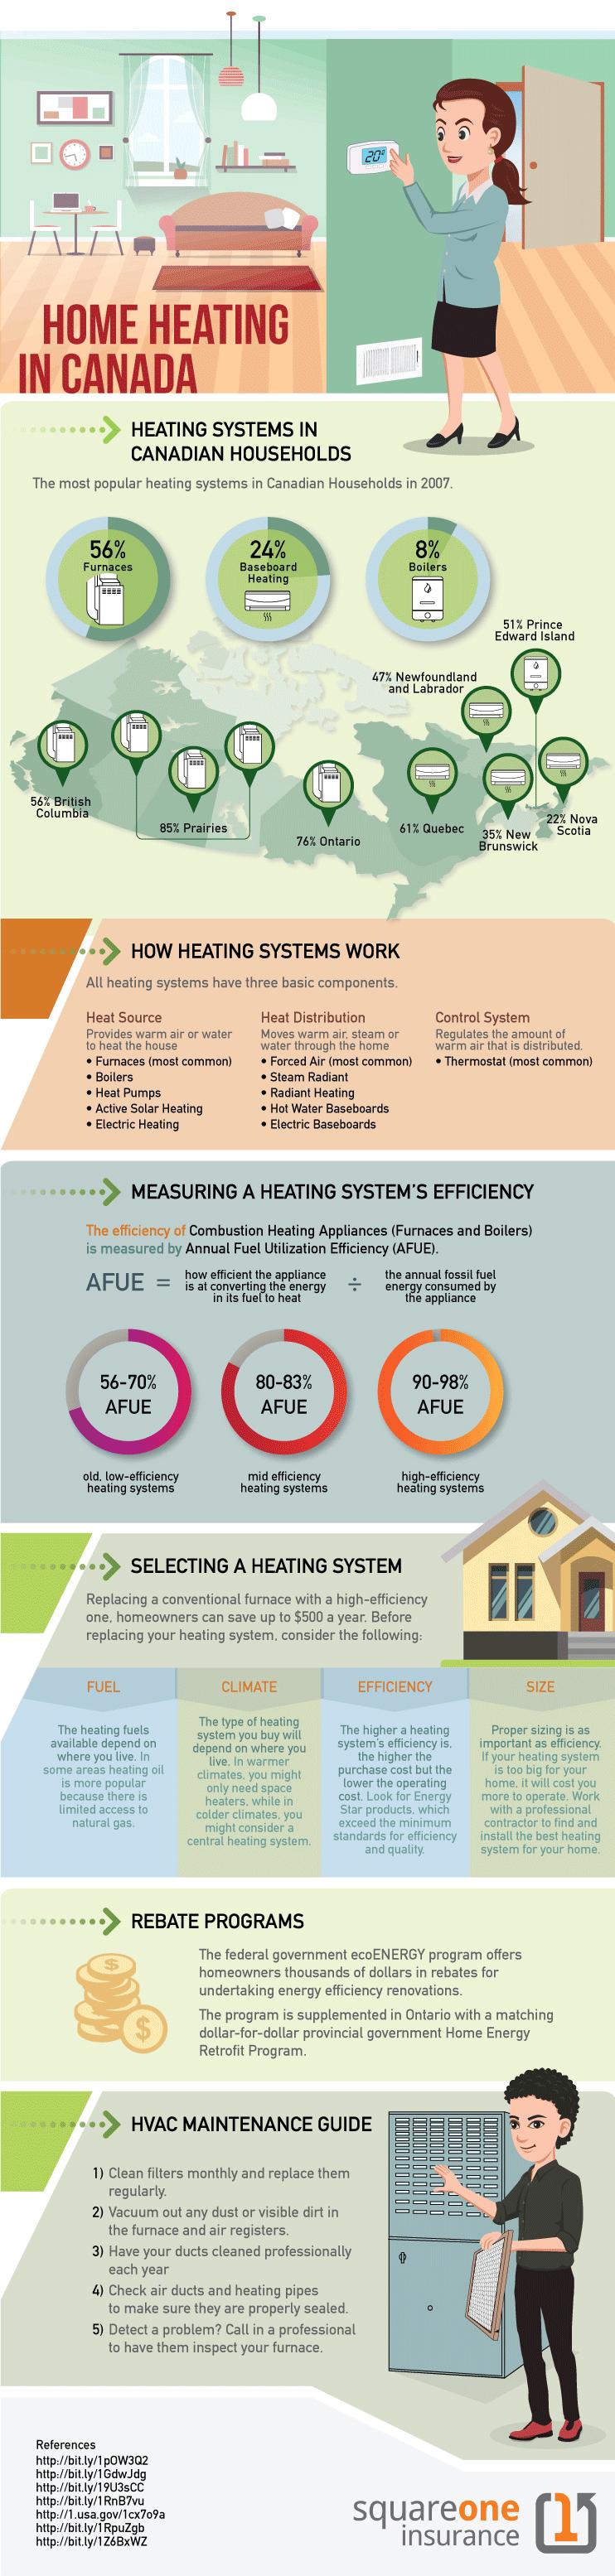 Infographic_HVAC